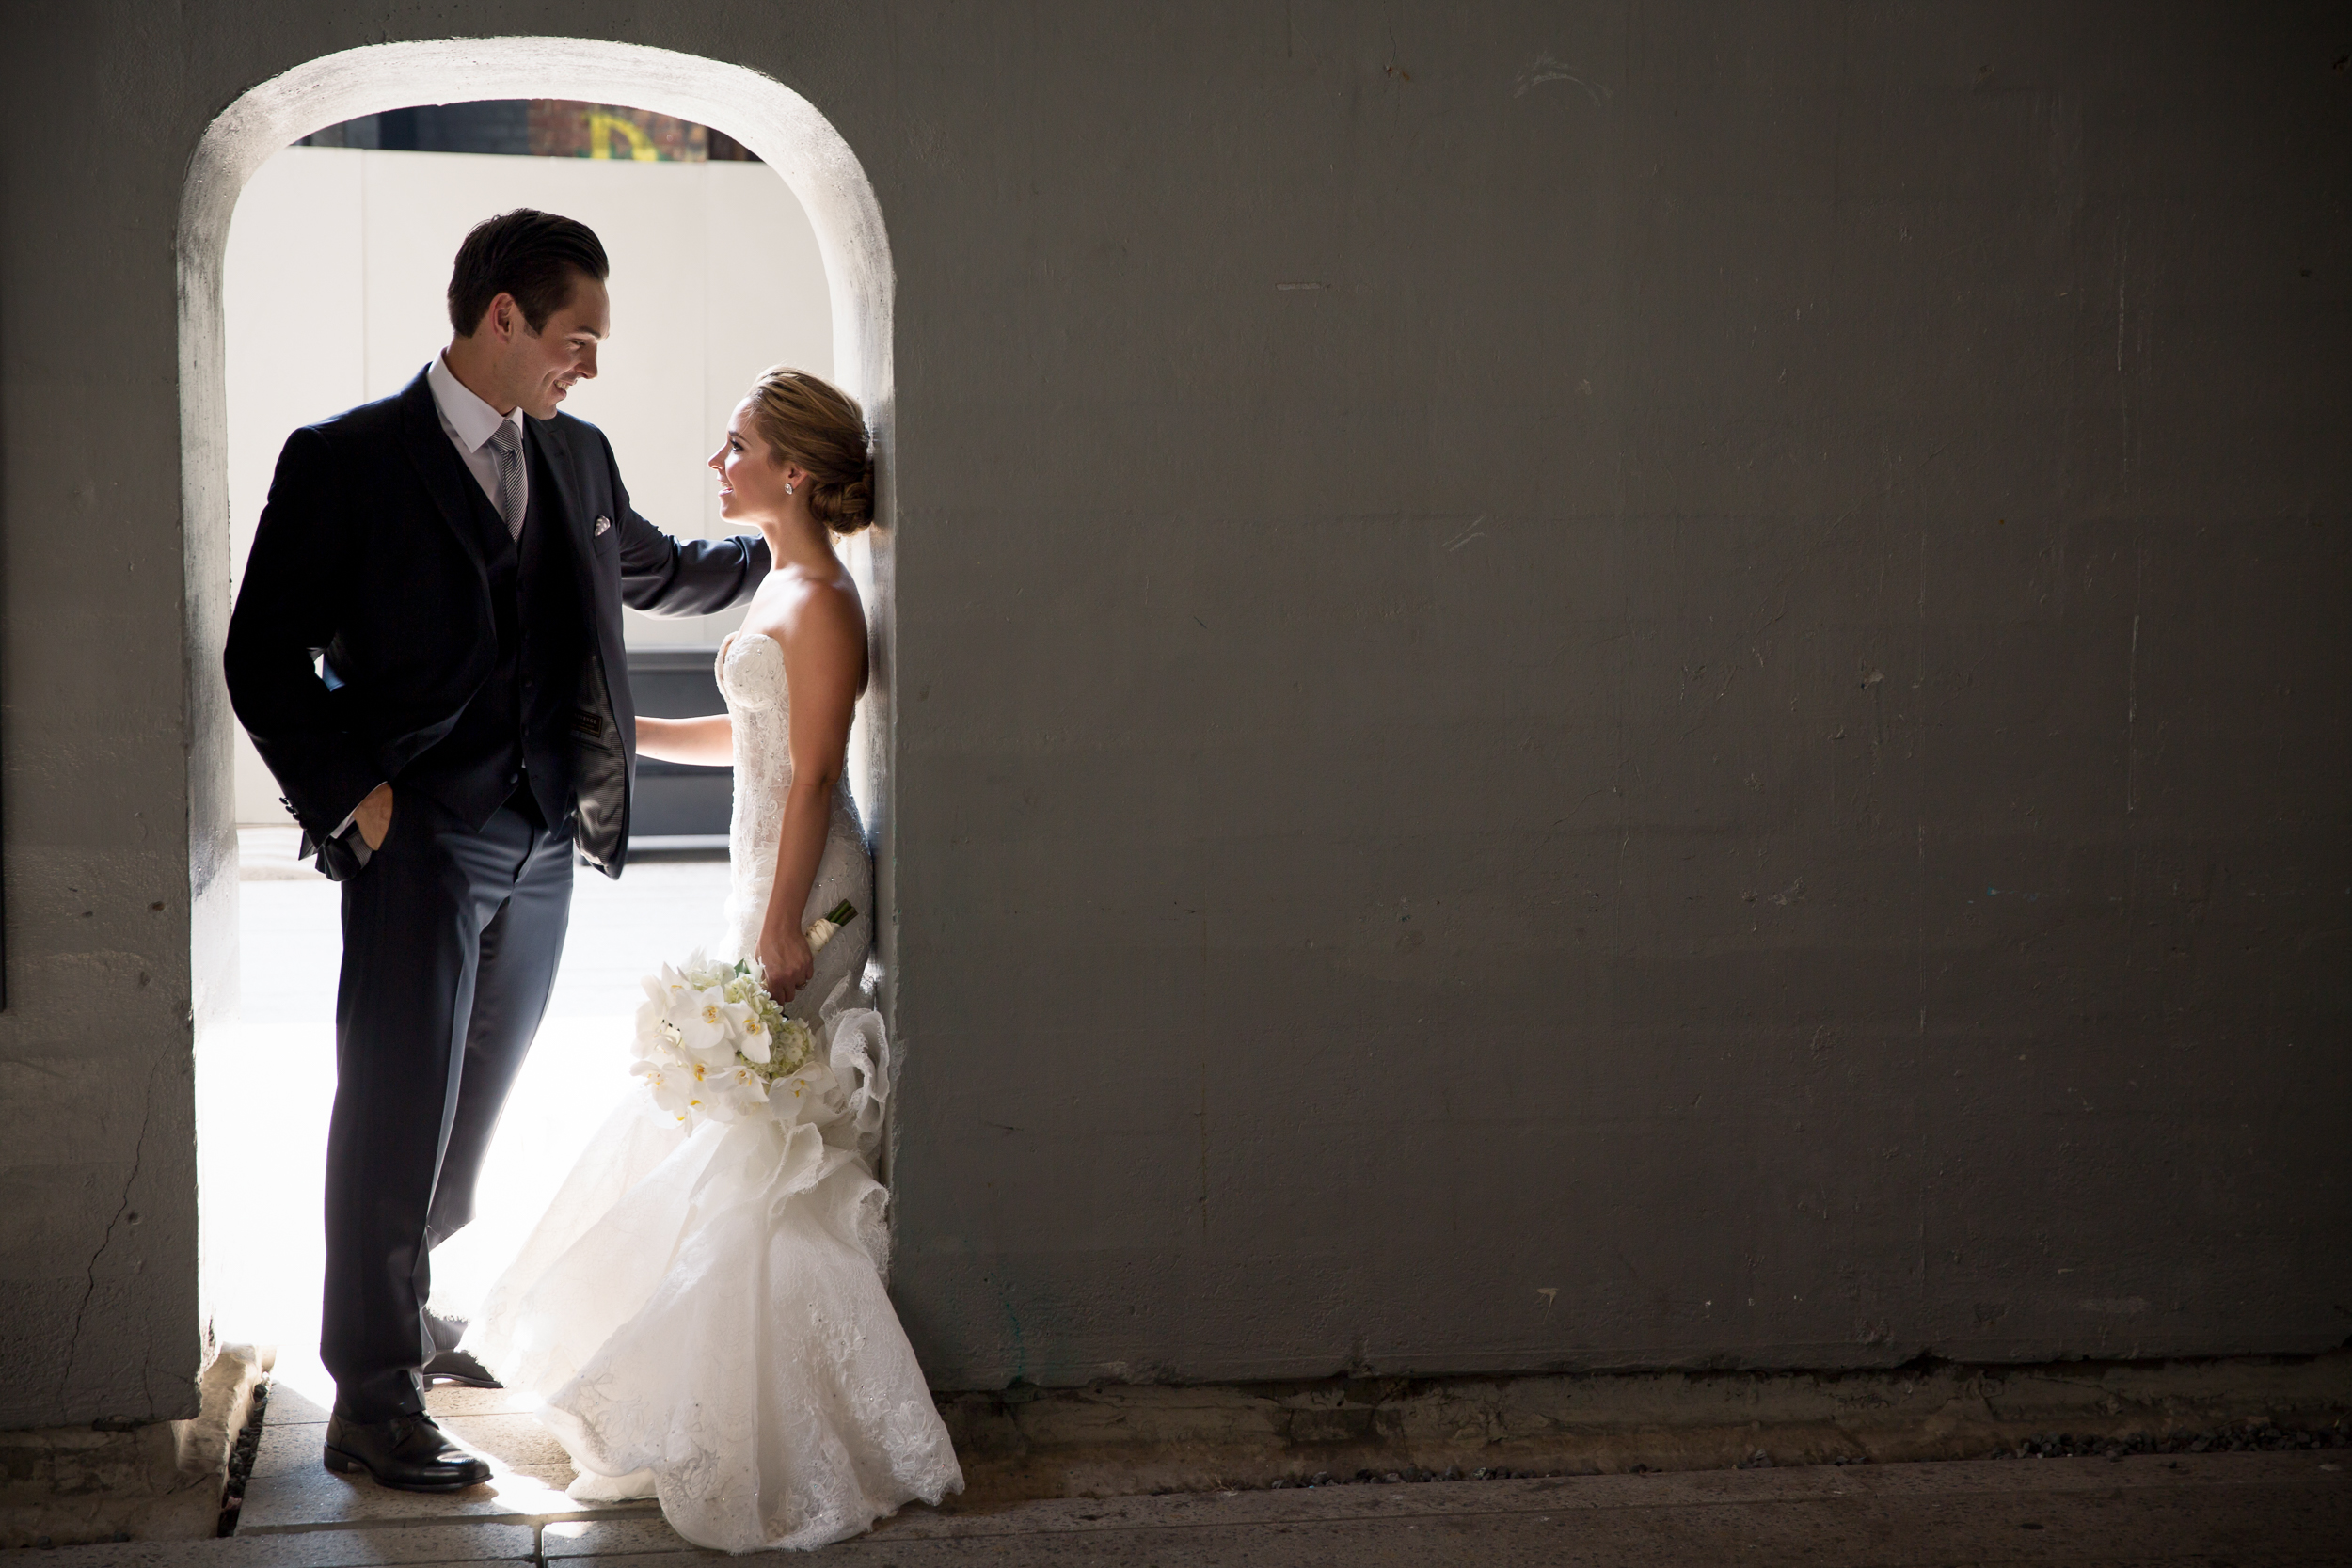 Ceci_New_York_Style_Luxury_Custom_Summer_Wedding_CeciBride_Letterpress_NewYork_Foil_Lighthouse_Chelsea_Piers_22.jpg